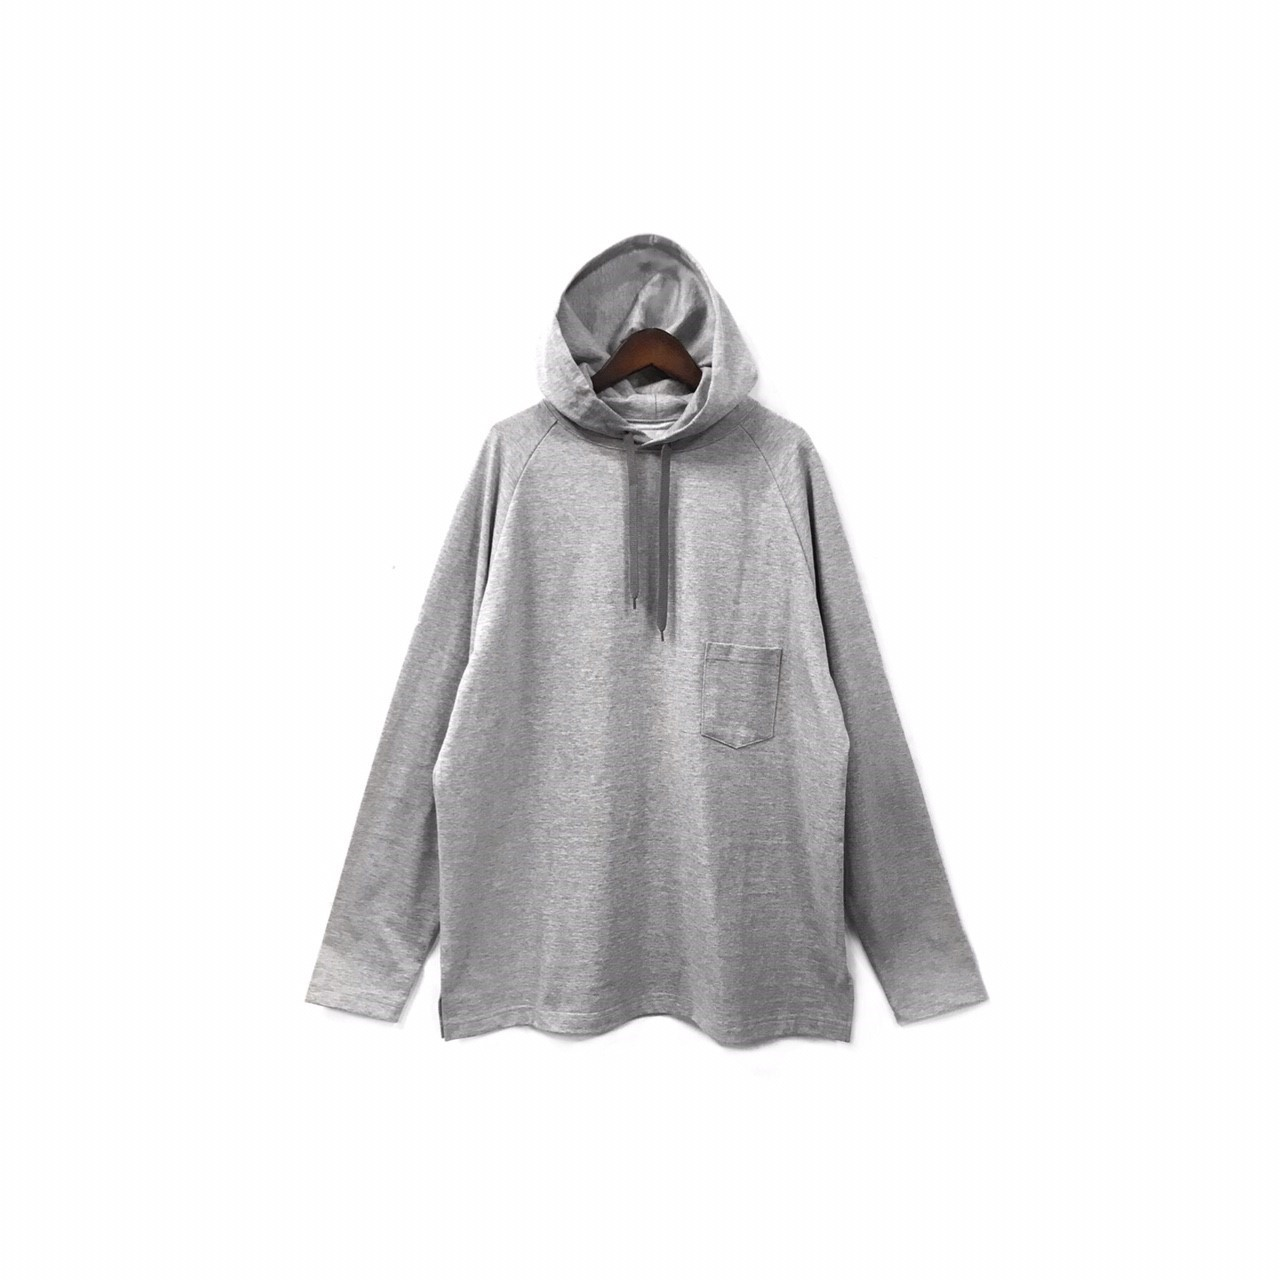 yotsuba - Hooded Cut&Sew / Gray ¥12000+tax